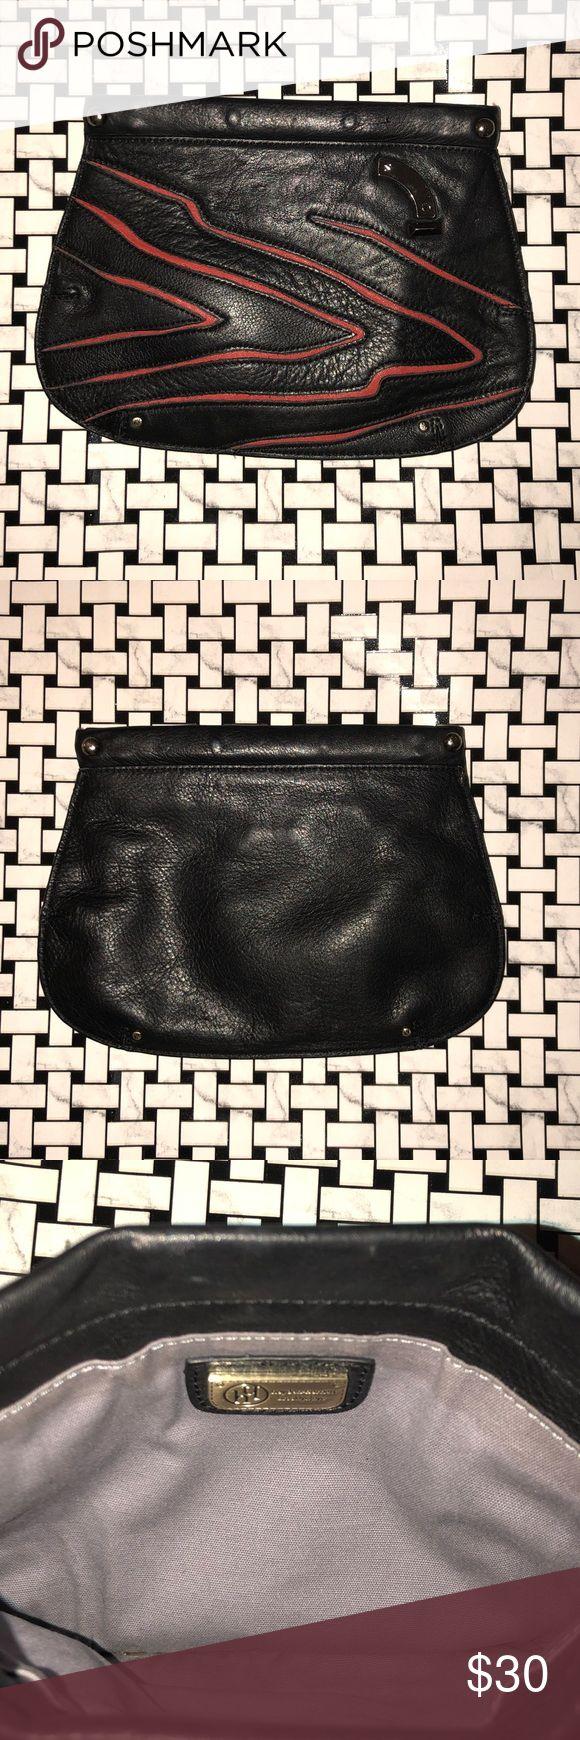 Hayden Harnett leather Clara flat clutch Hayden Harnett clutch  Black and red leather  Metal opening (magnetic) Hayden Harnett Bags Clutches & Wristlets